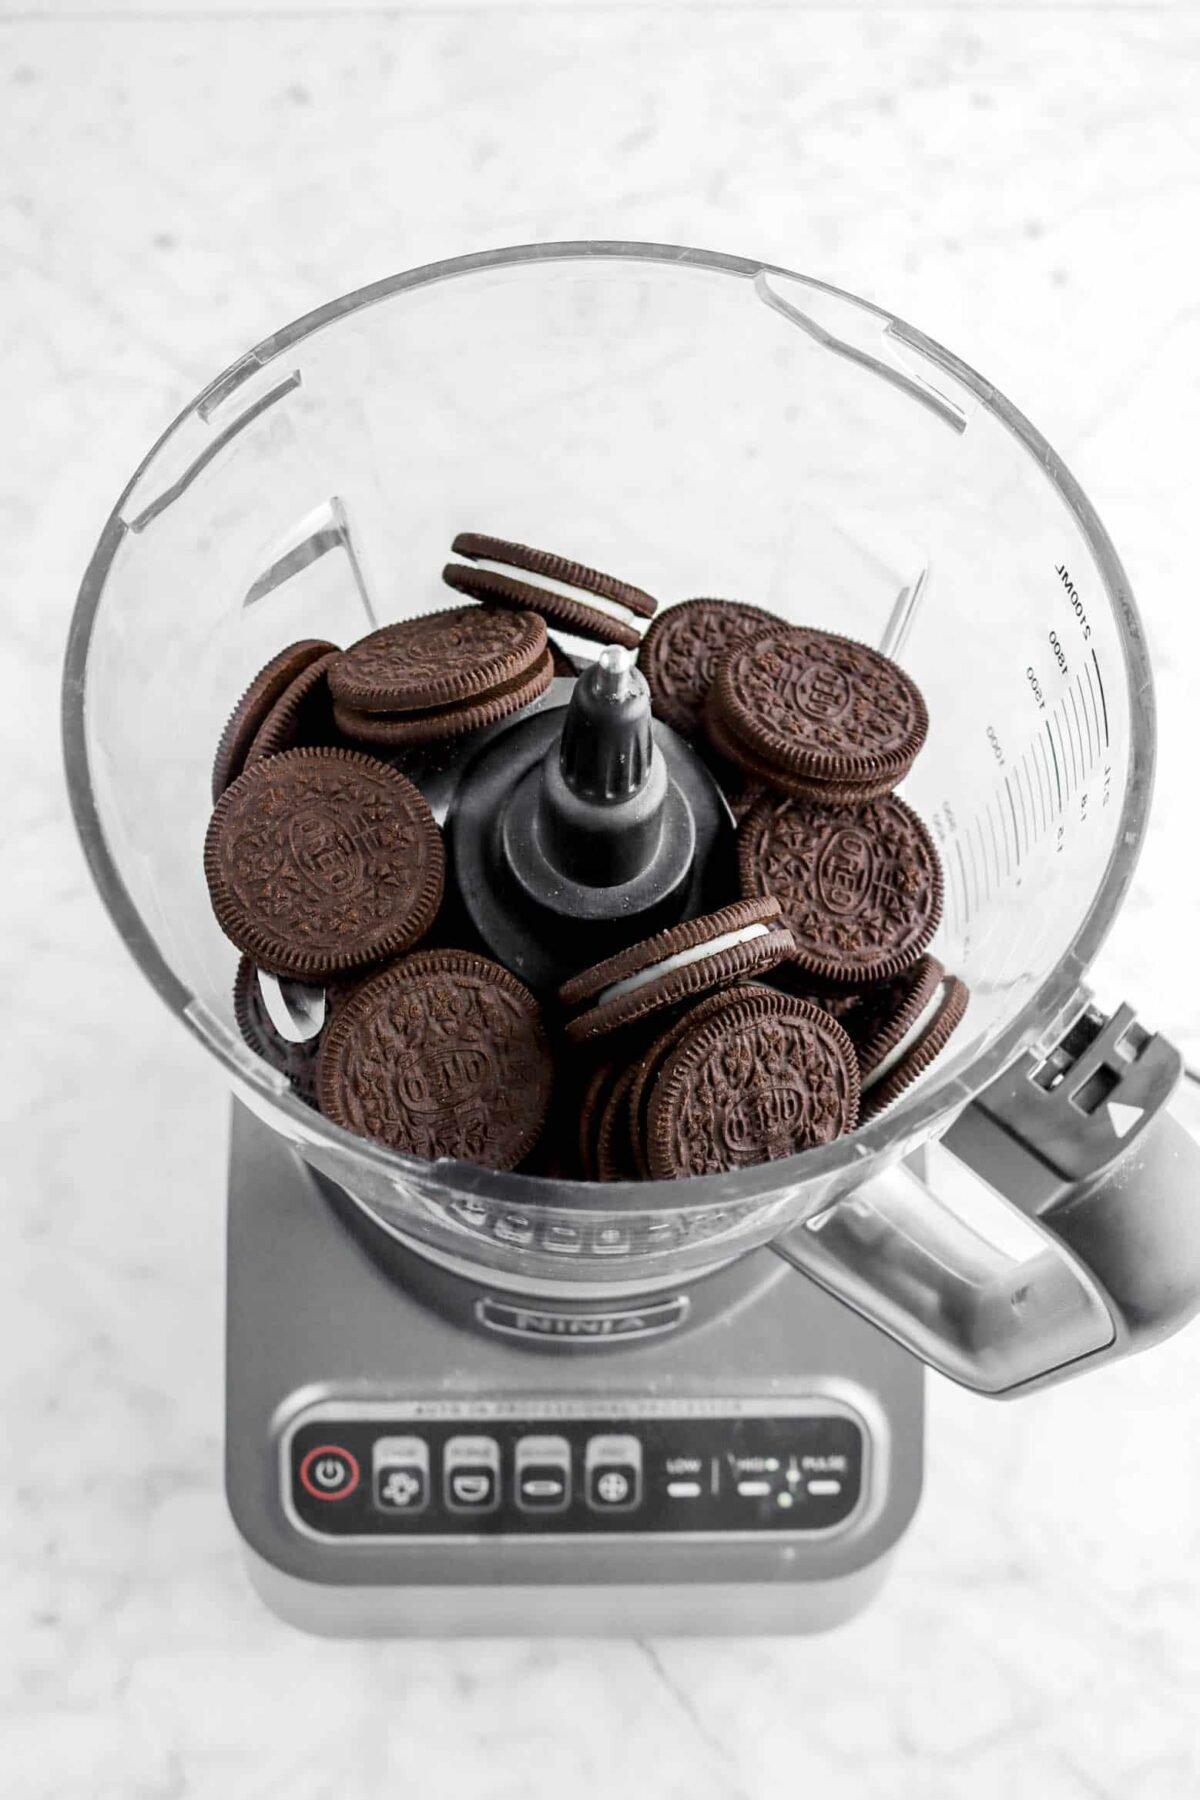 oreos in a food processor